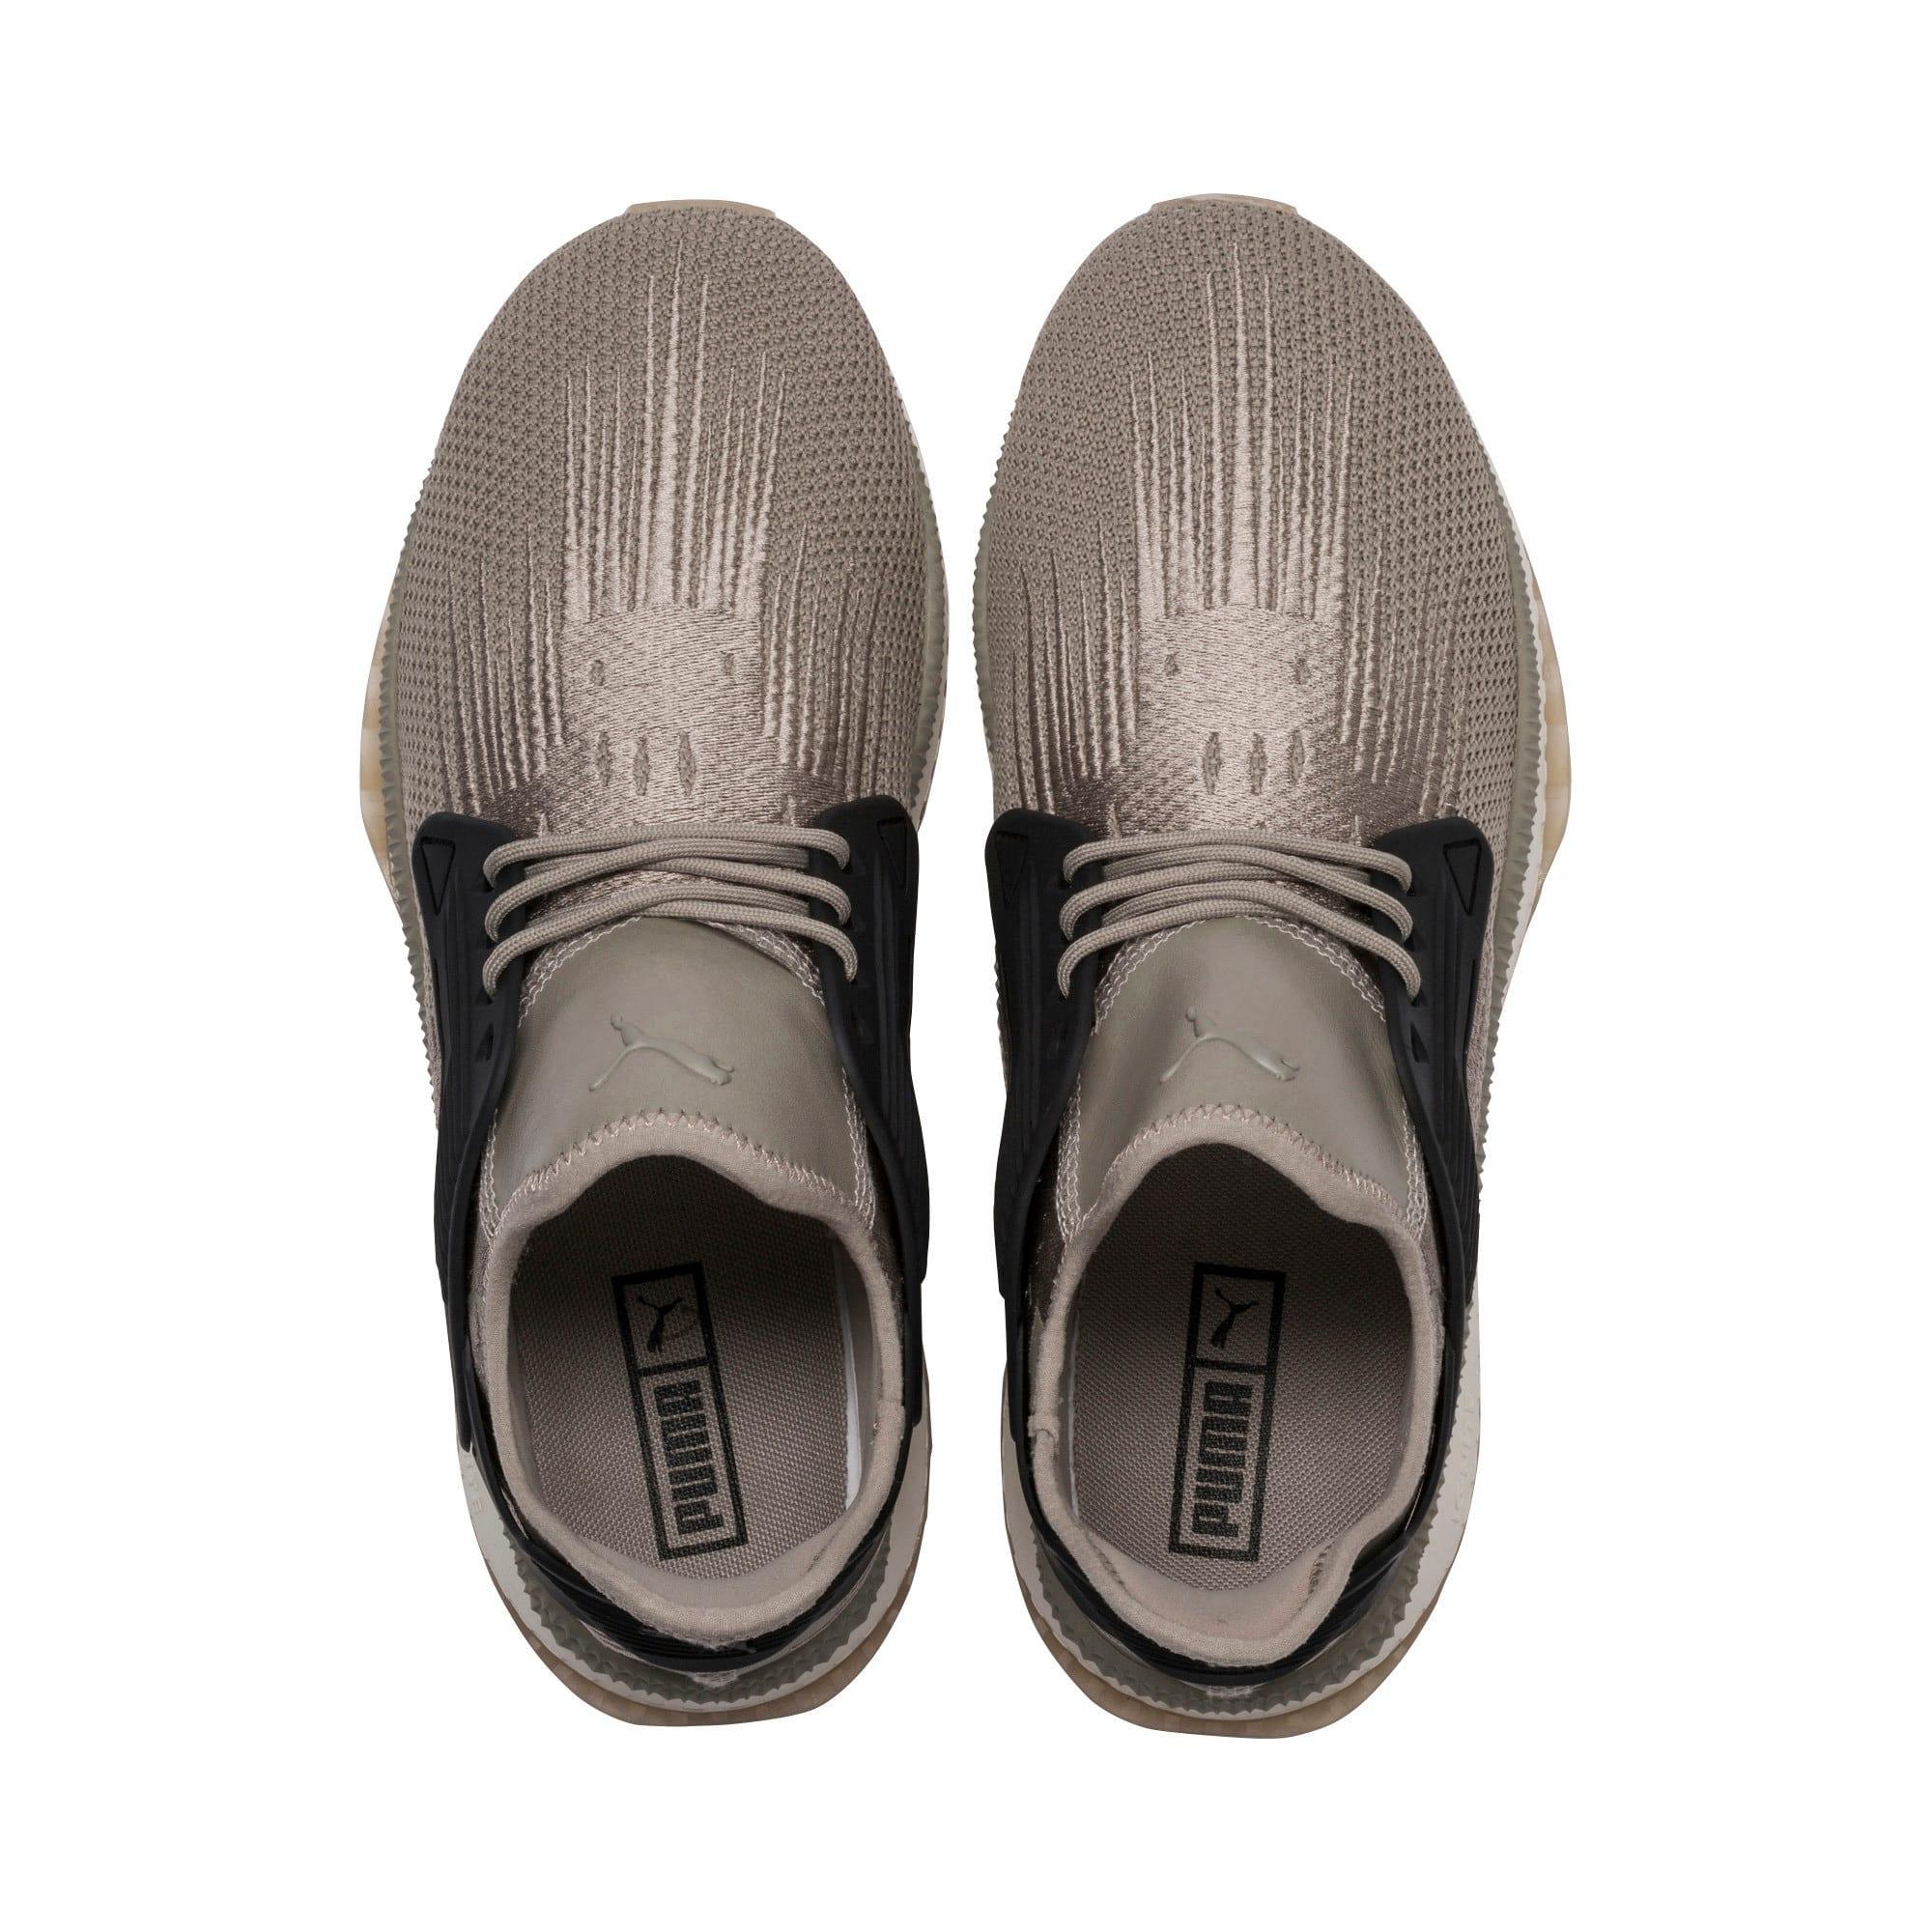 Thumbnail 6 of TSUGI Cage Premium Sneakers, Elephant Skin-Puma Black, medium